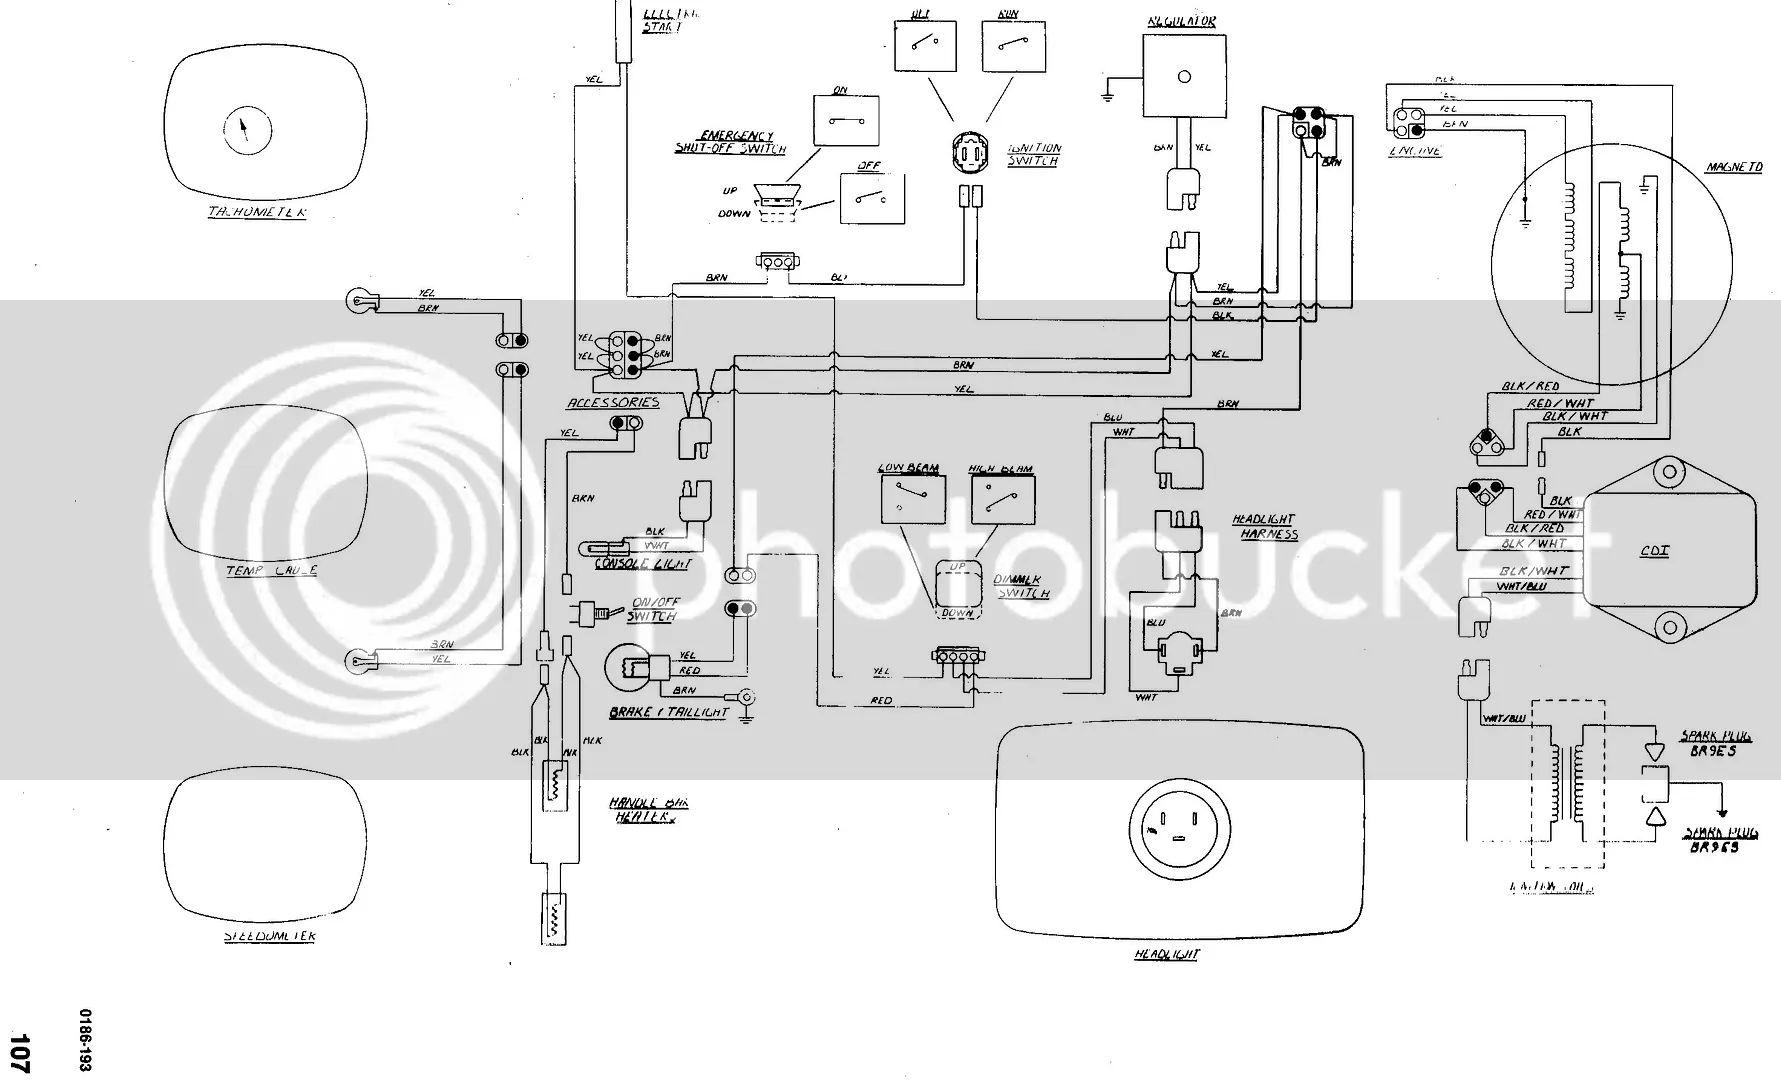 artic cat jag wiring diagram for 1979